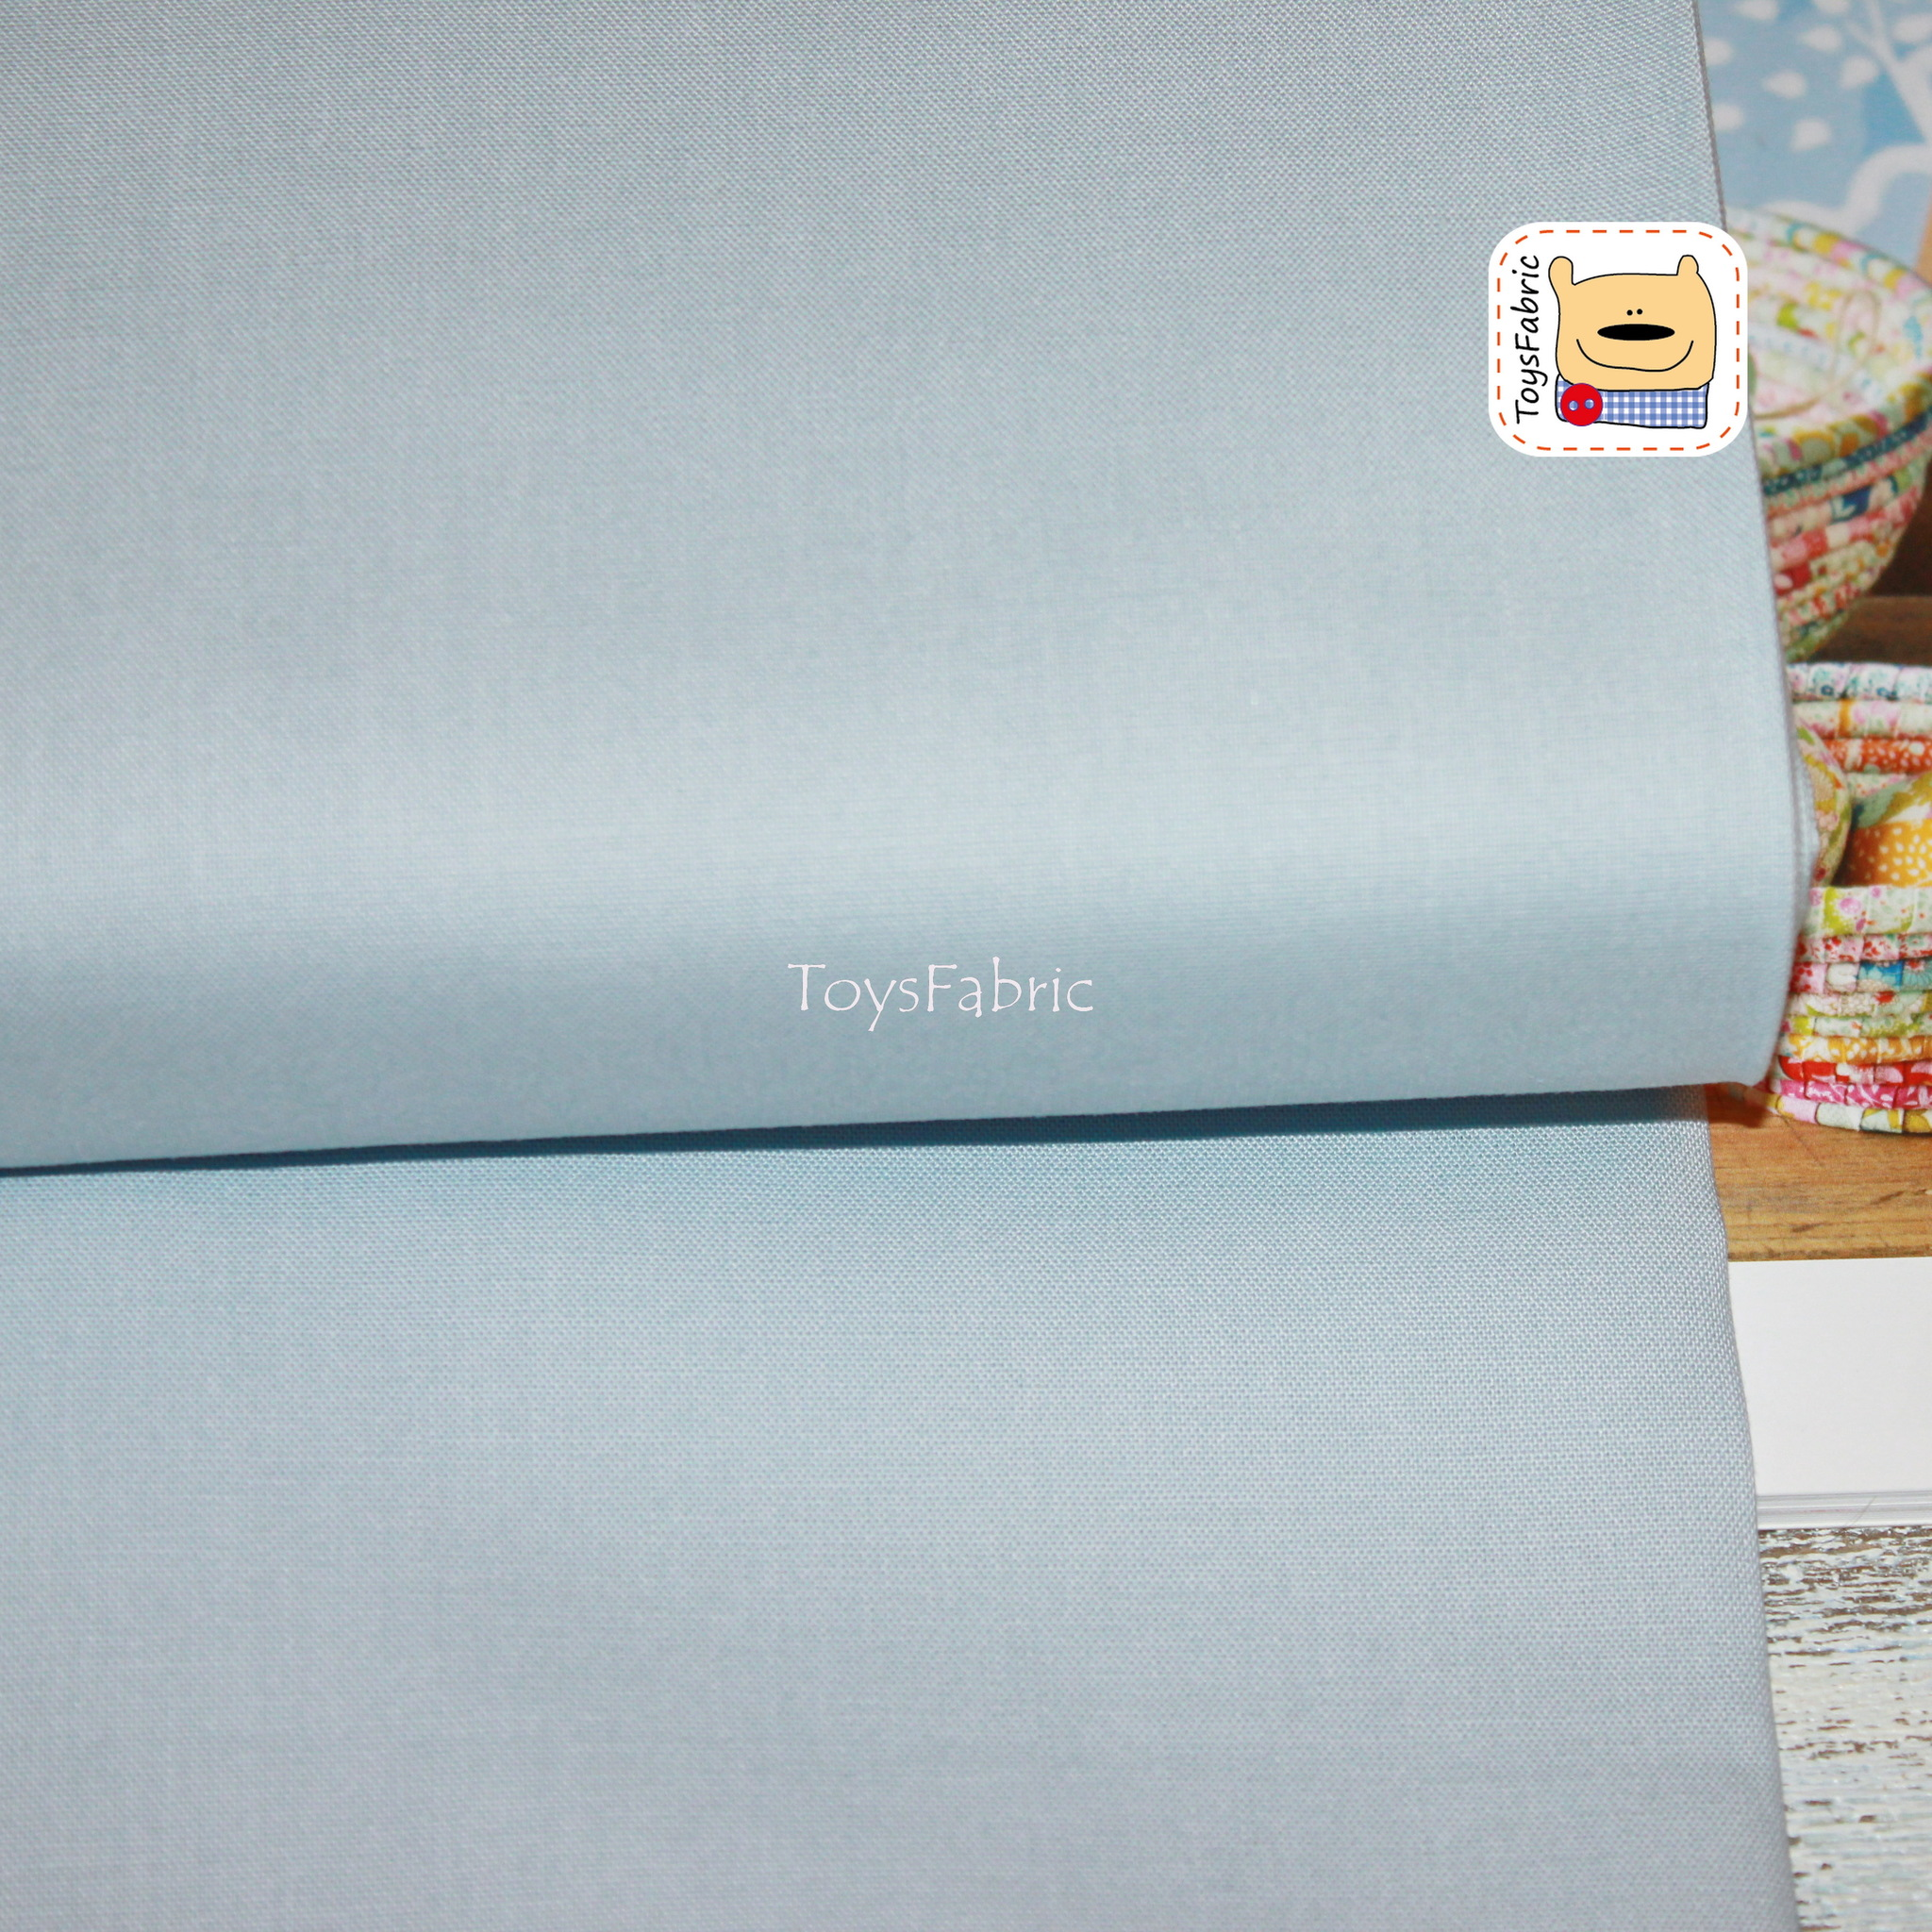 Ткань для пэчворка 20822 корейский хлопок (однотонный голубой) 45х55см